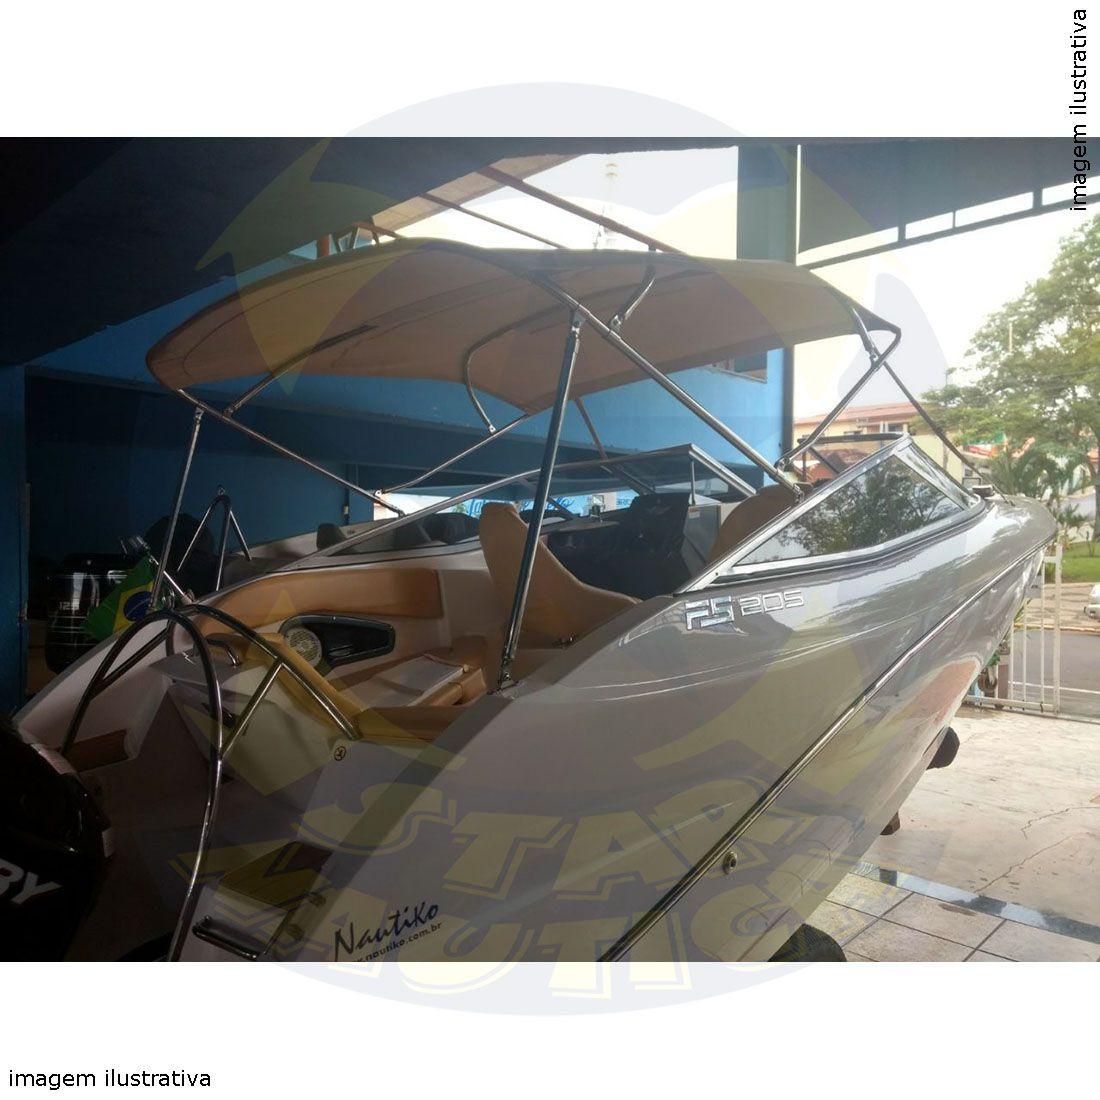 Capota Toldo Lancha Focker 200 Poliéster 4 Arcos Tubo 1 1/4